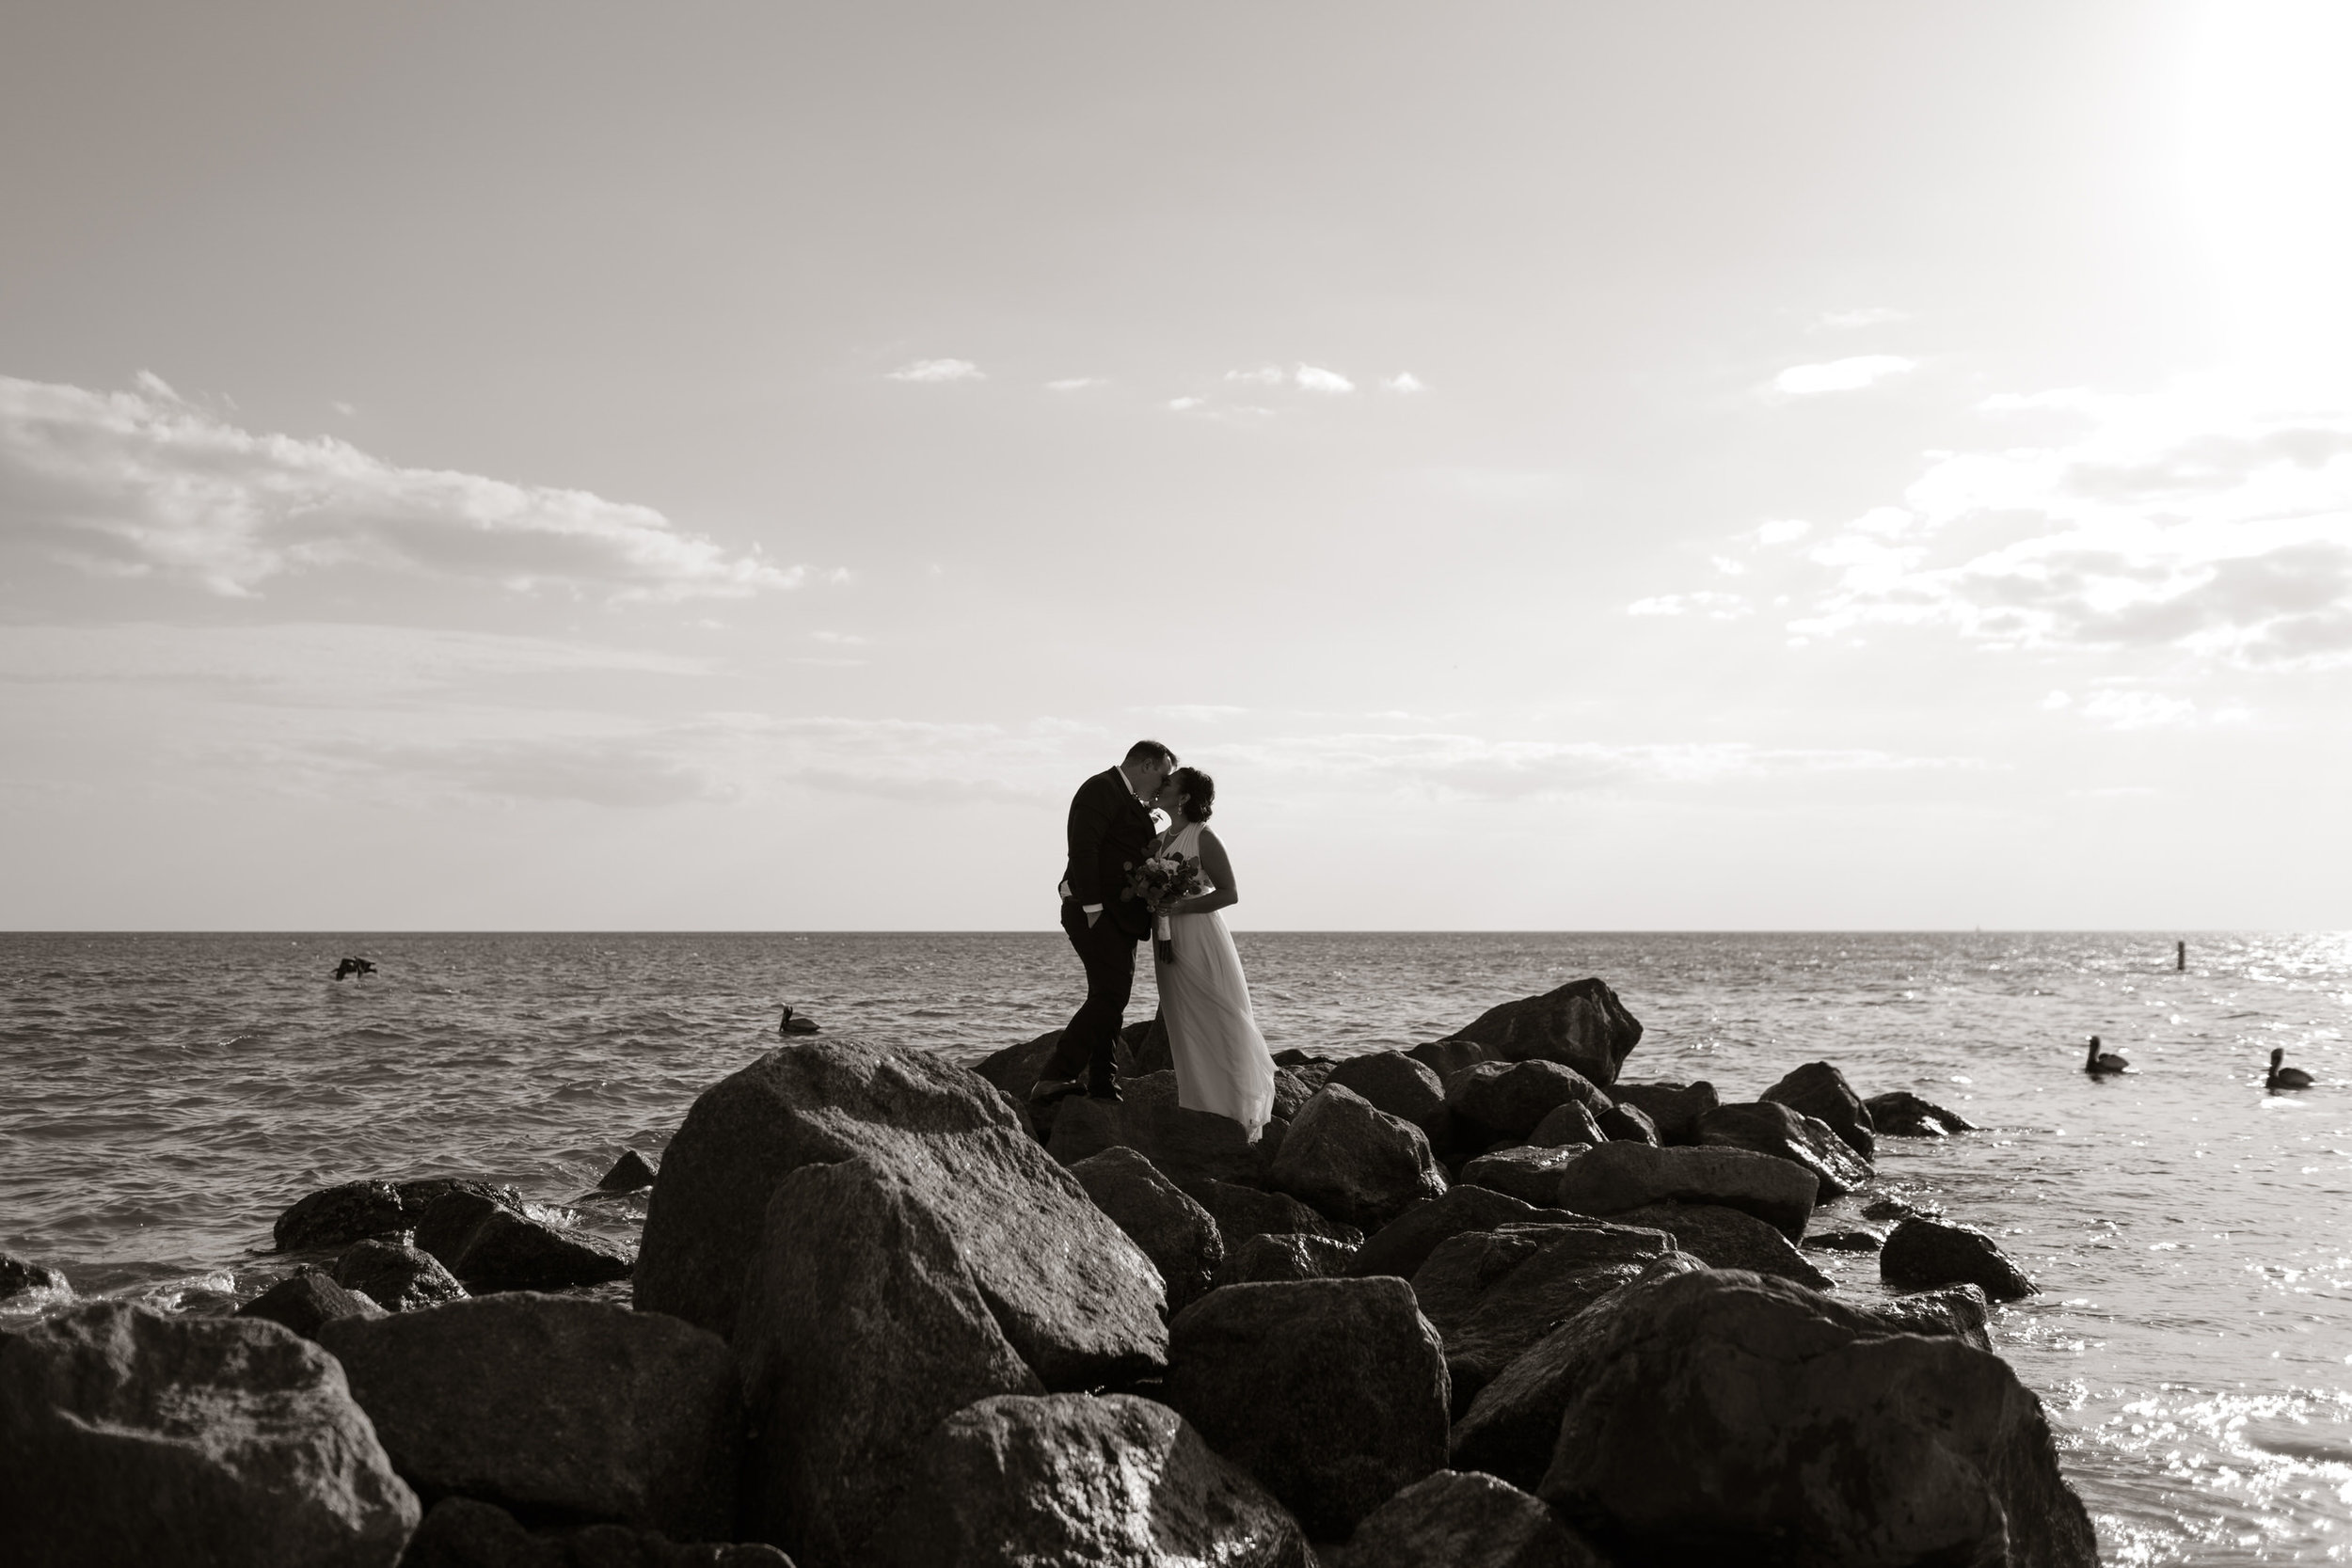 Beltran_Treasure_Island_Elopement_Tampa_Wedding_028-1.jpg